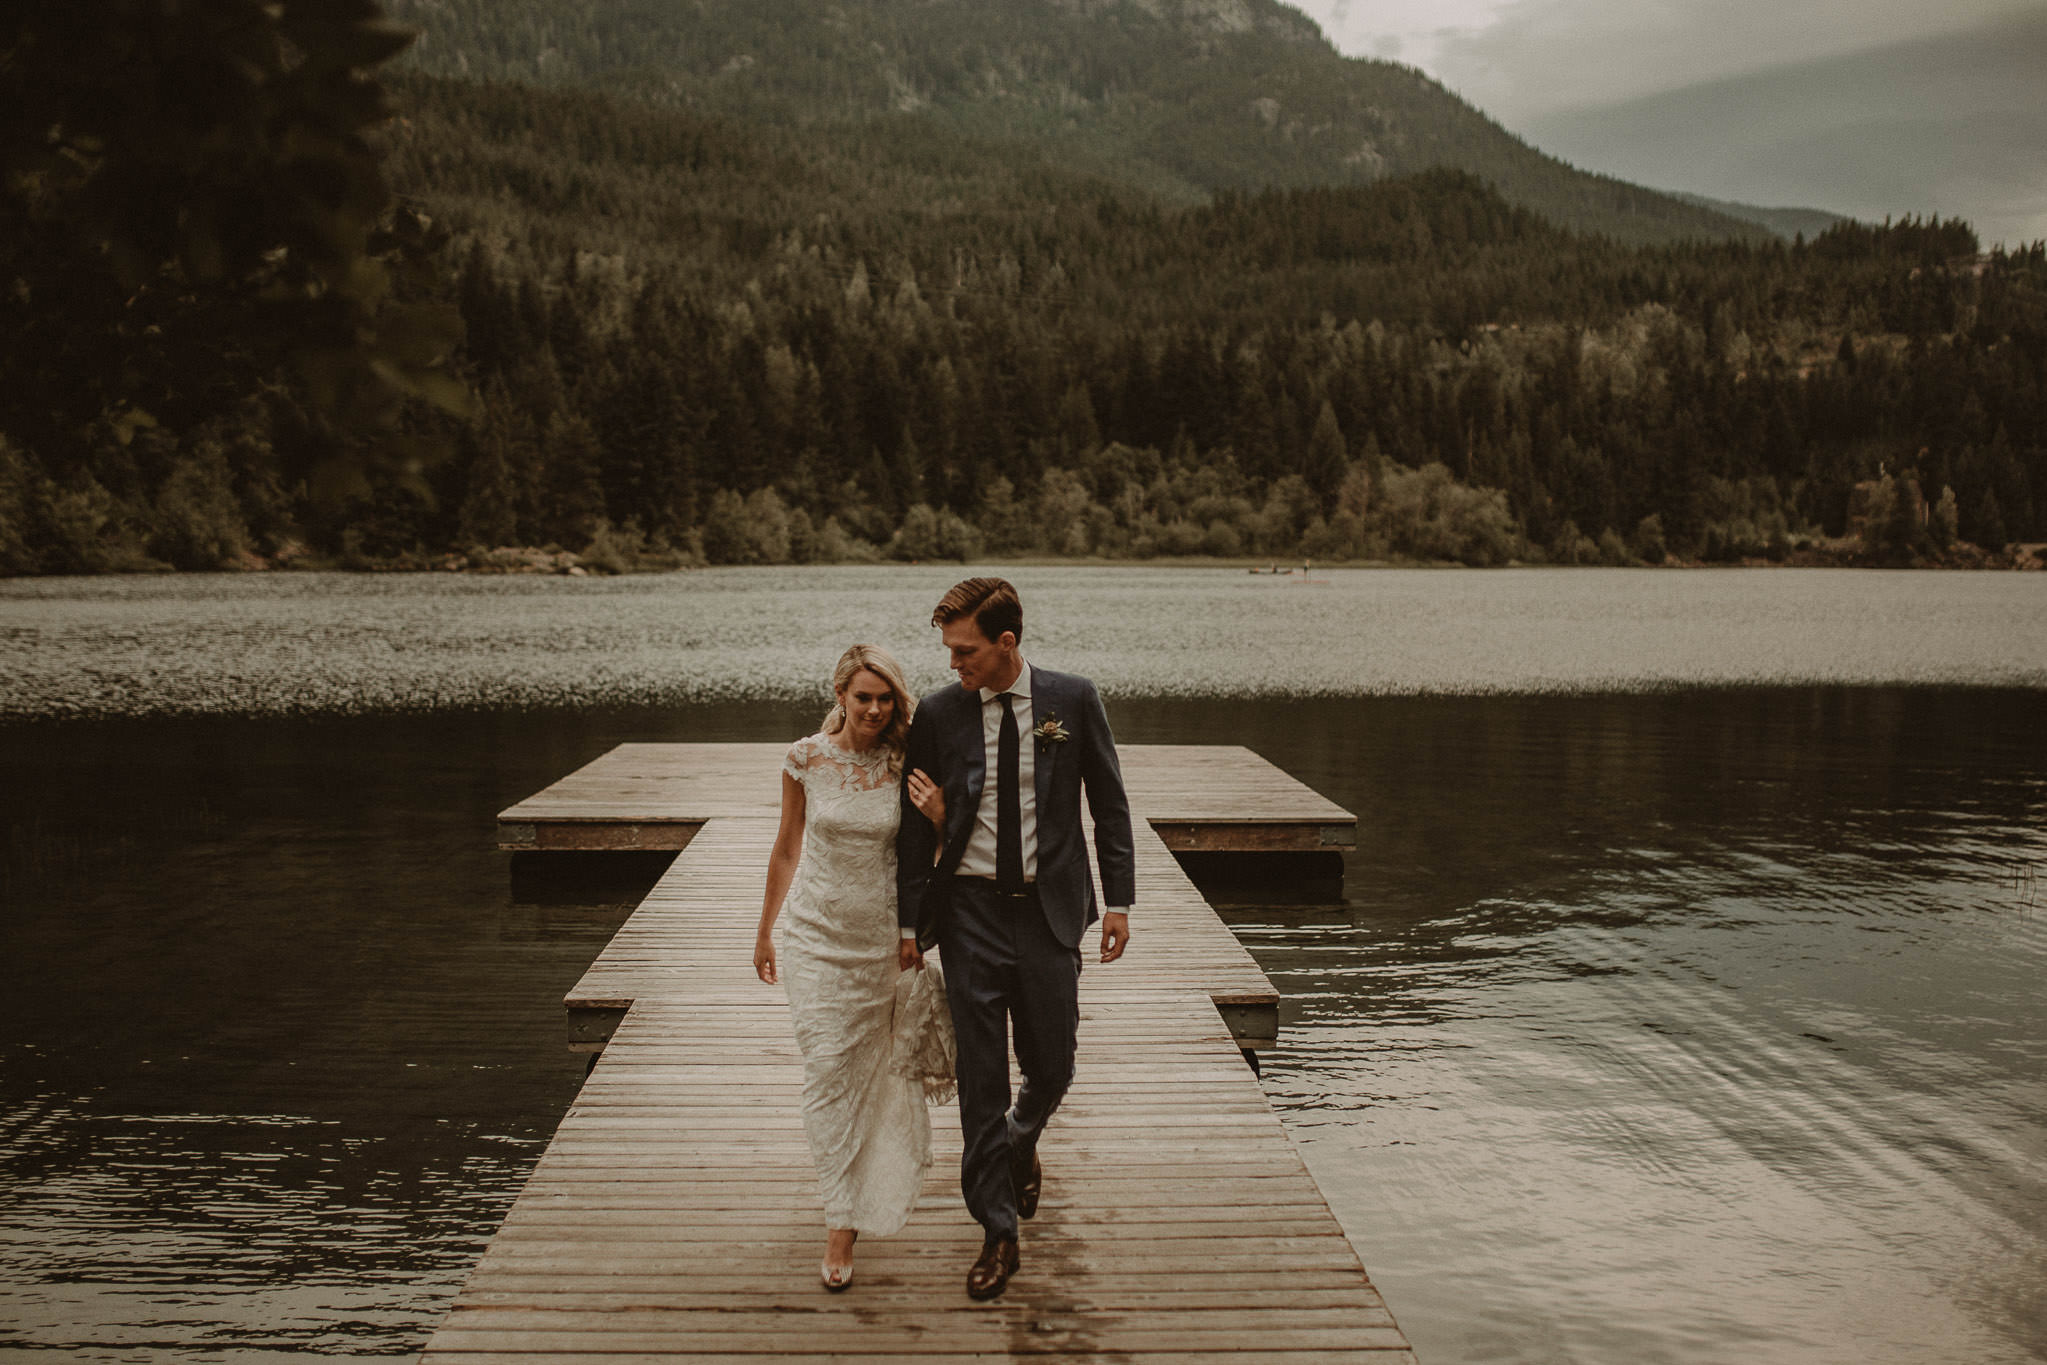 Vancouver-Whistler-wedding-photographer-020-2